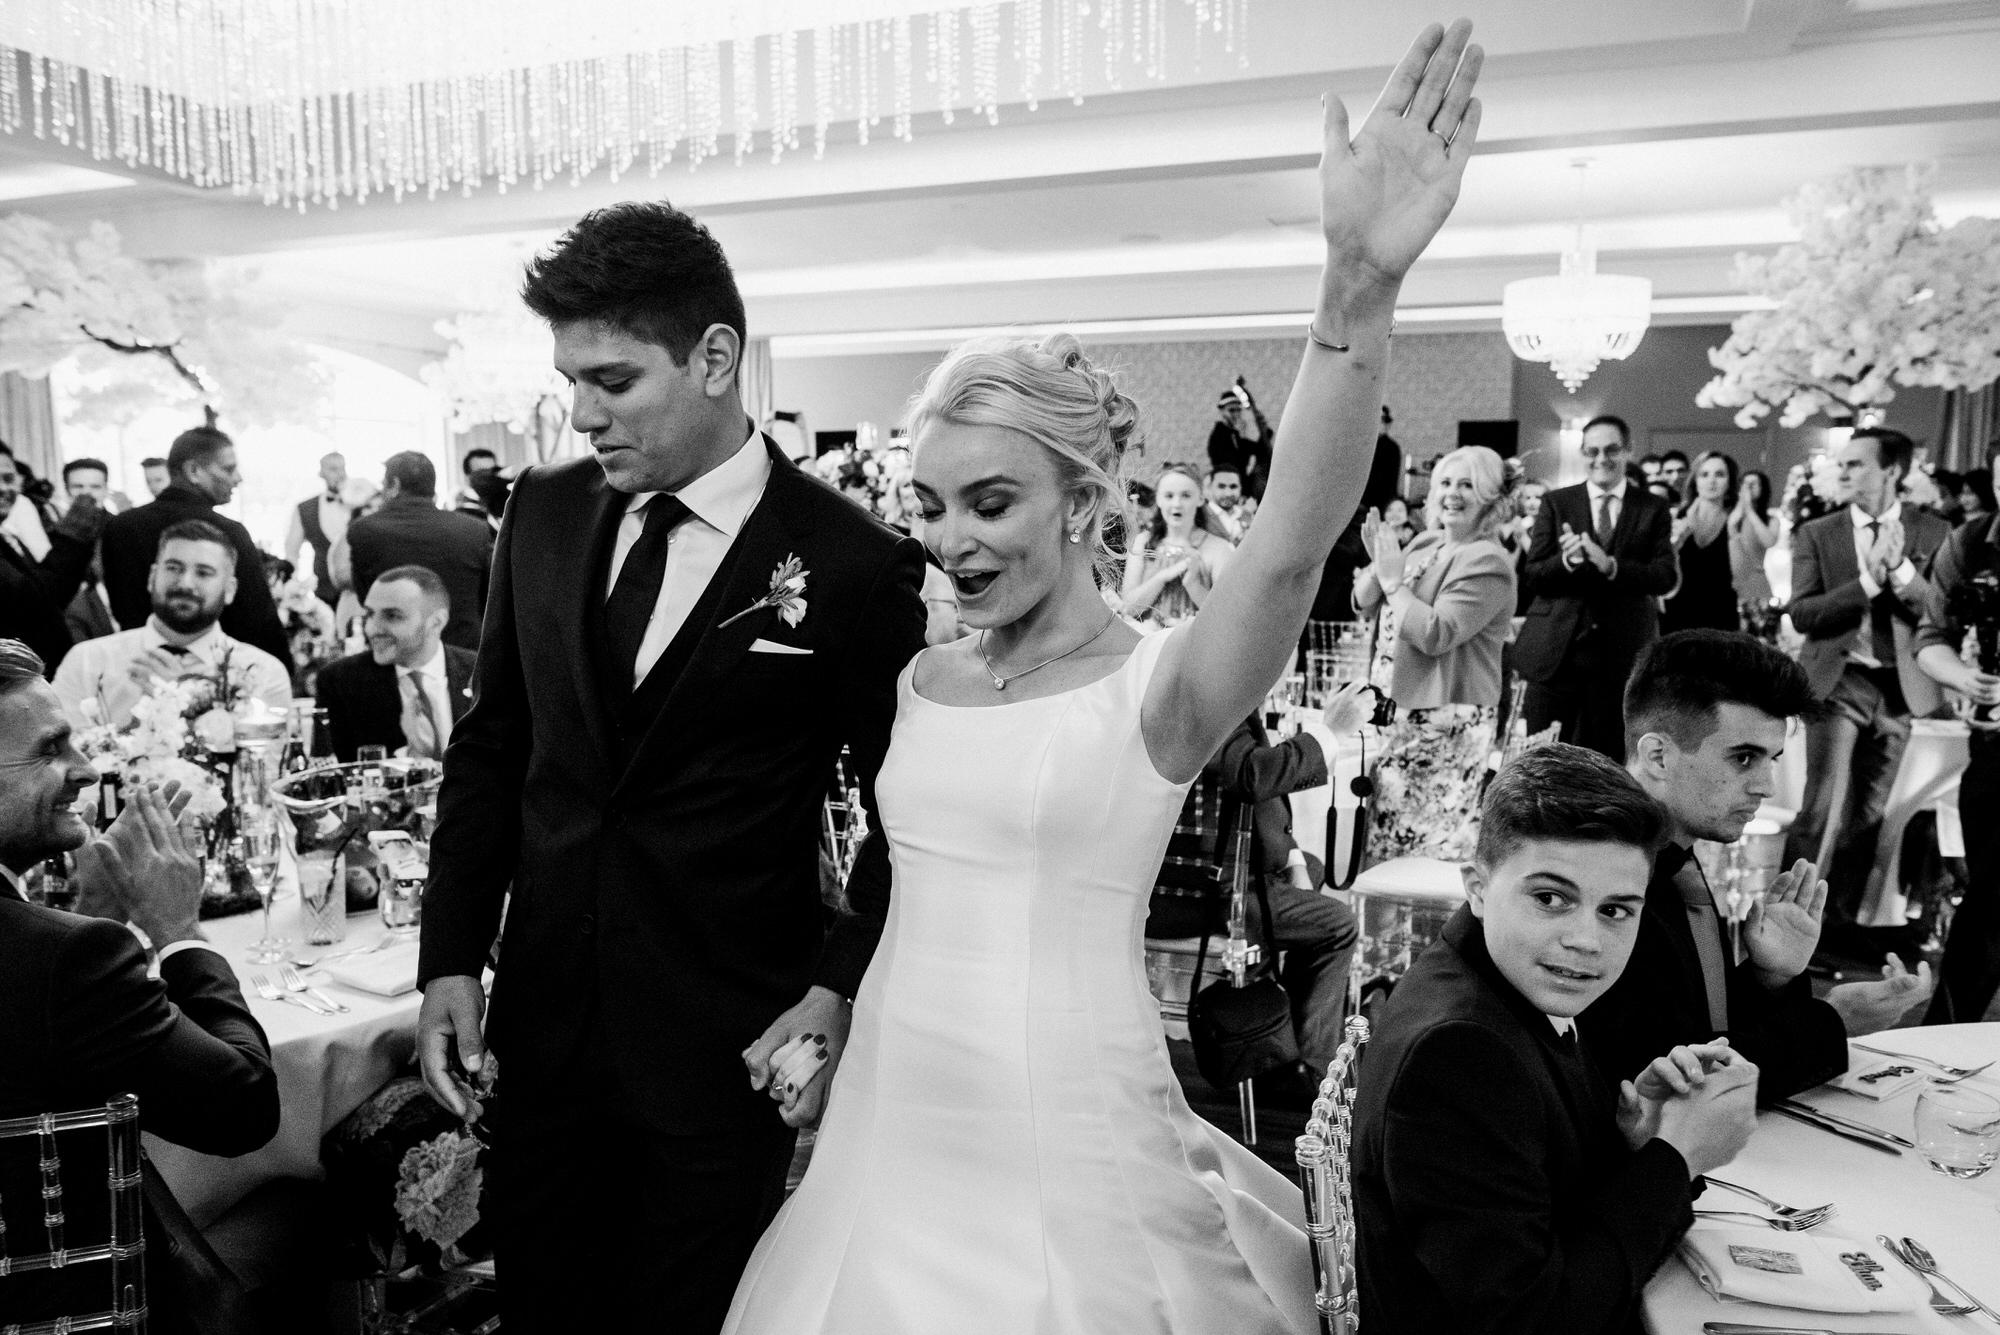 Merrydale manor wedding photography 076